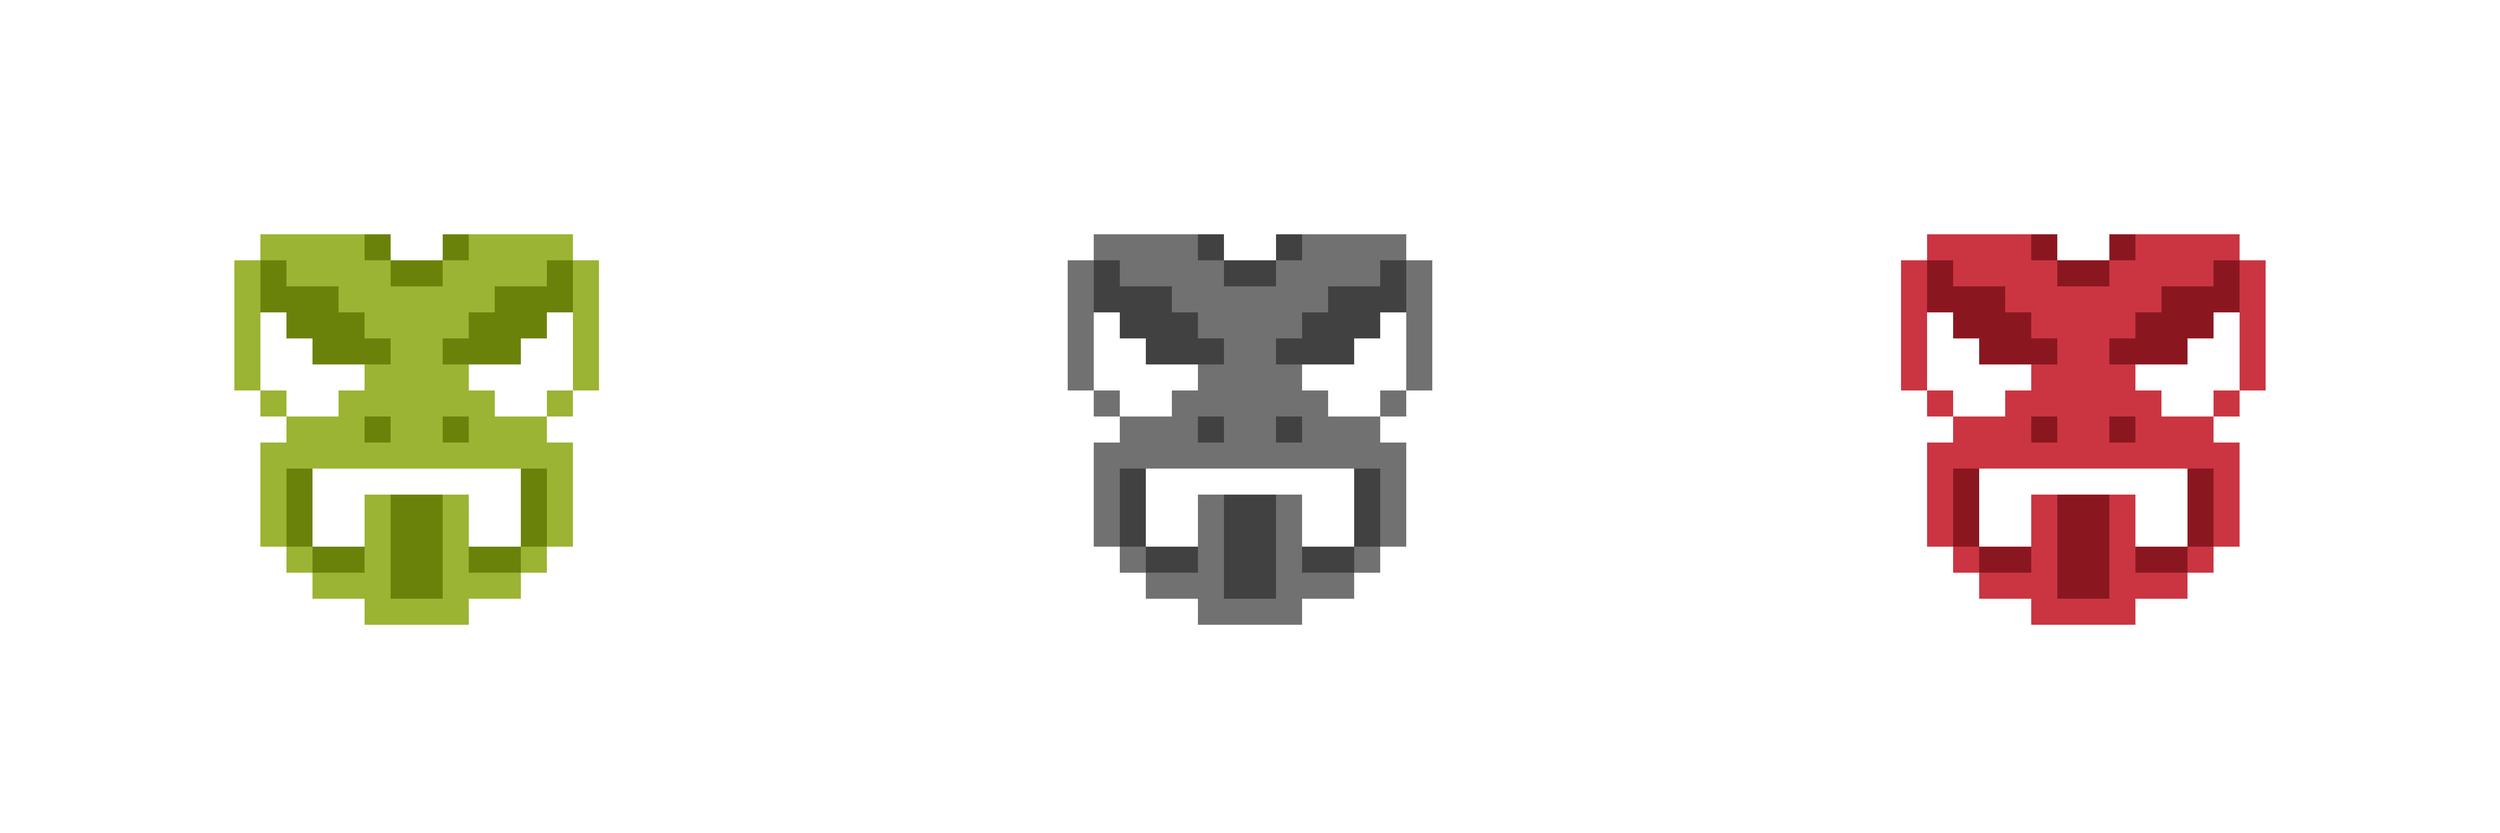 maori_pixels.png